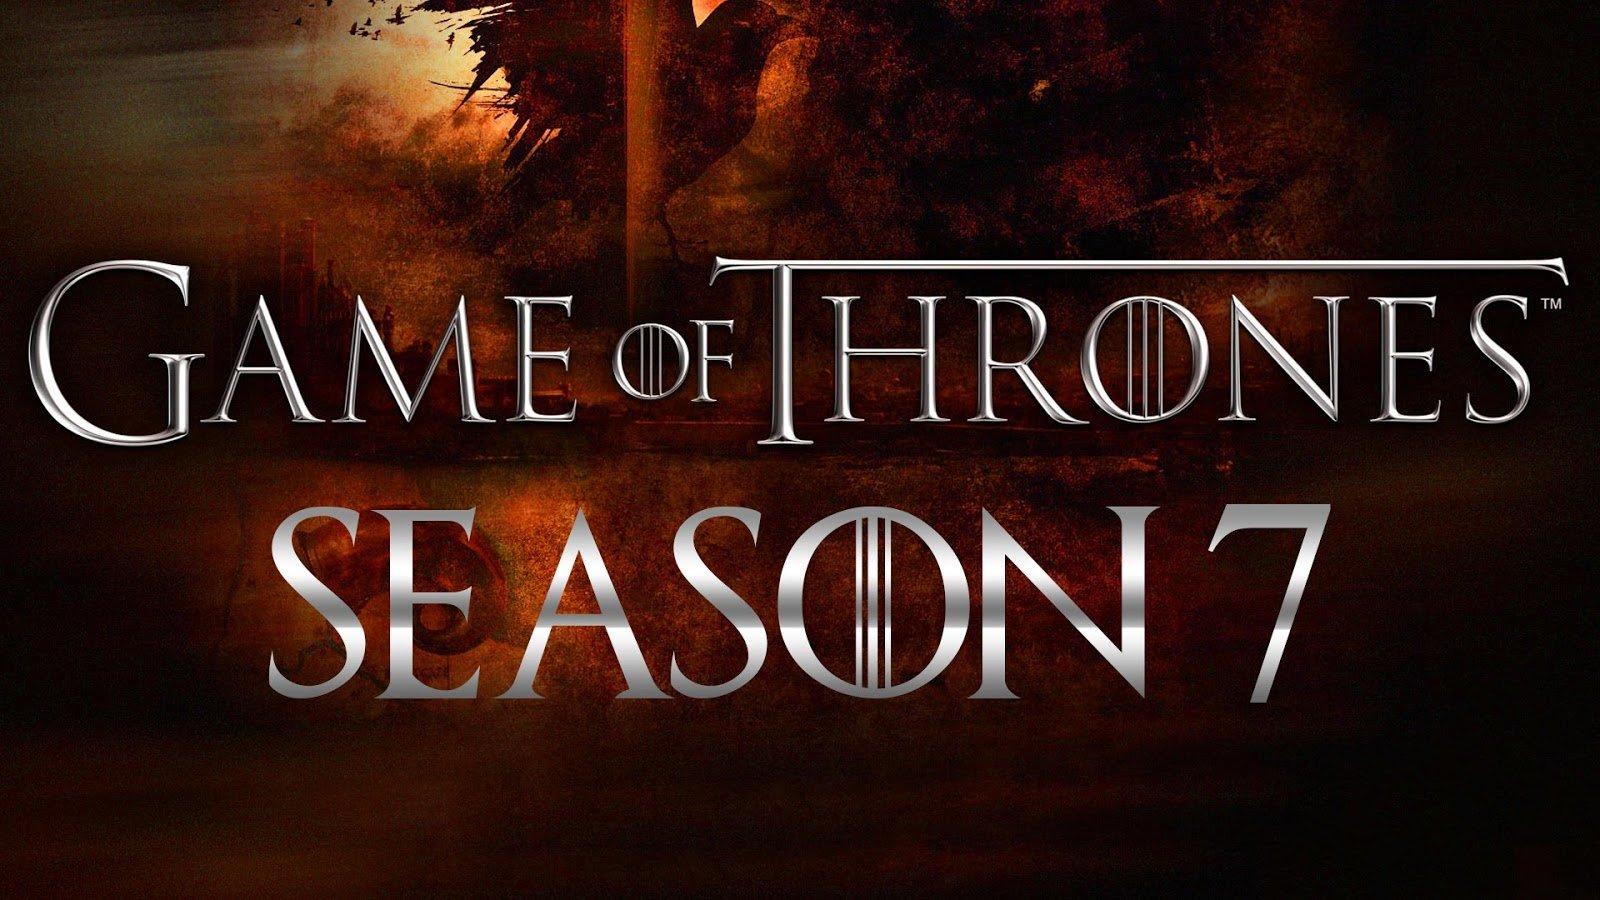 Game Of Thrones saison 7: des images tournées à Muriola Beach